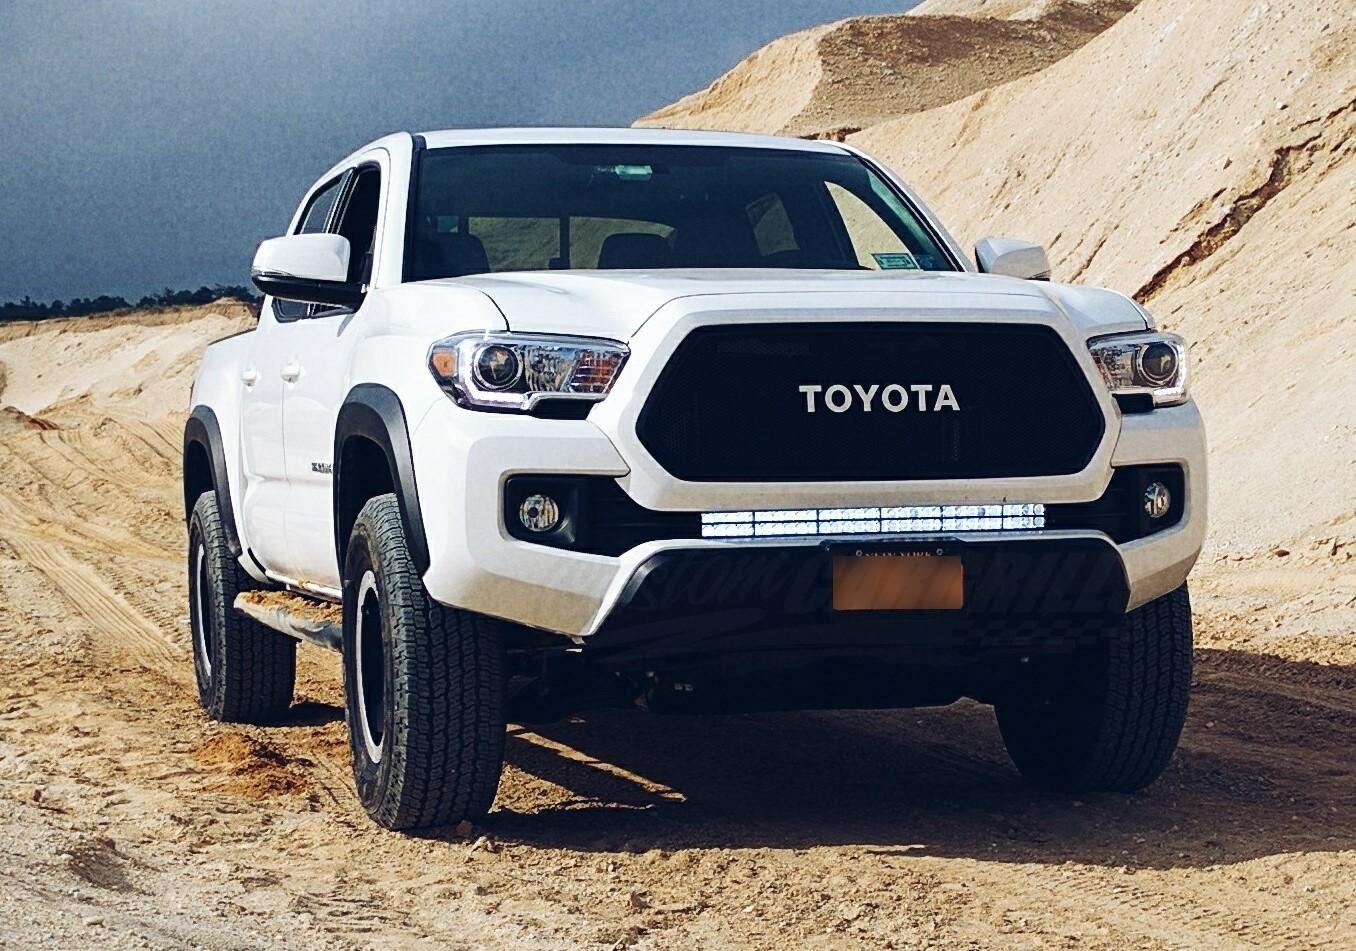 Toyota tacoma of service page 3 autos for Tacoma honda service